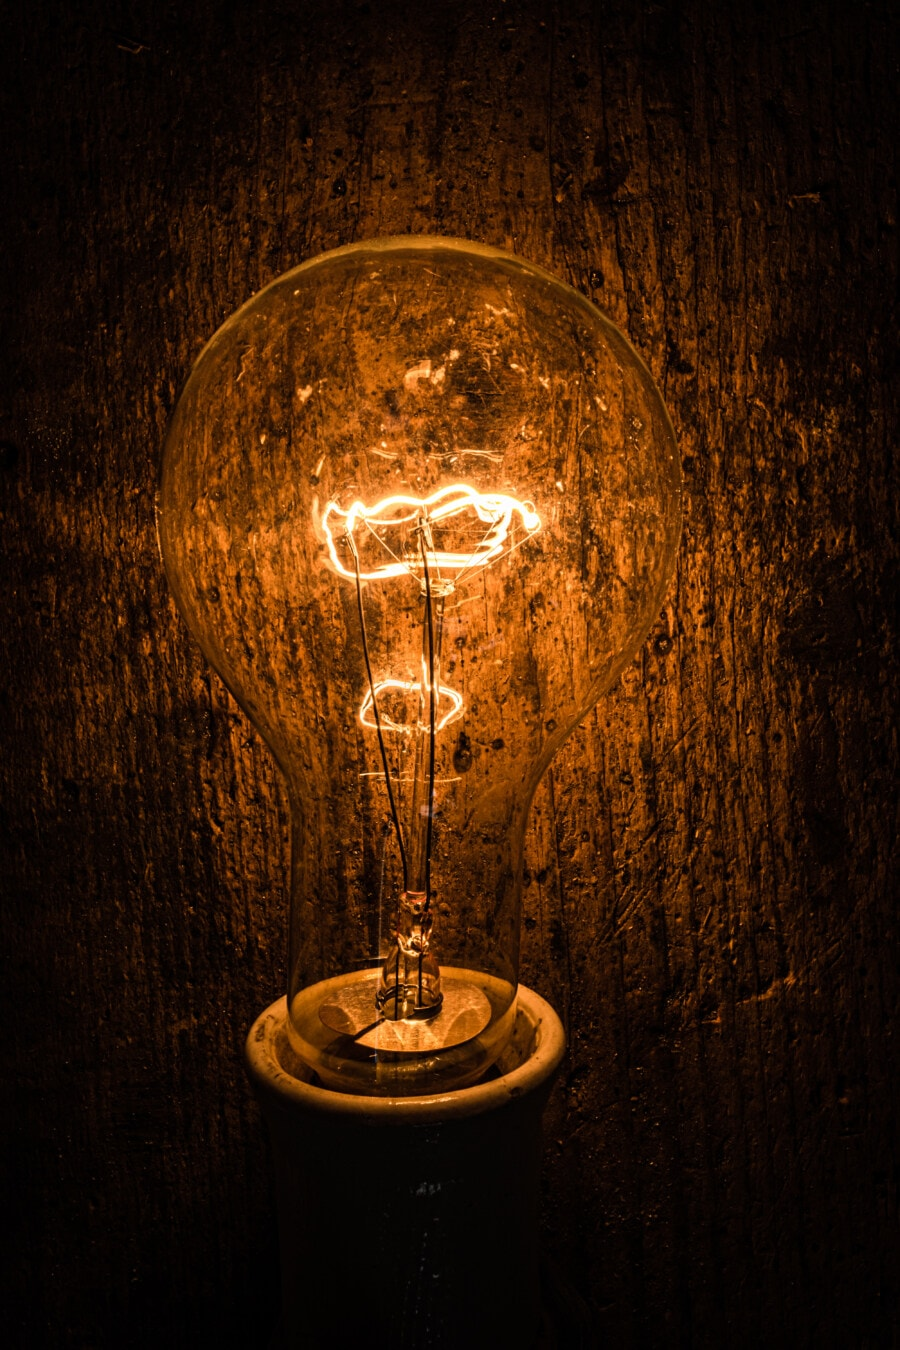 light bulb, vintage, darkness, wires, illumination, filament, bulb, electricity, dark, light